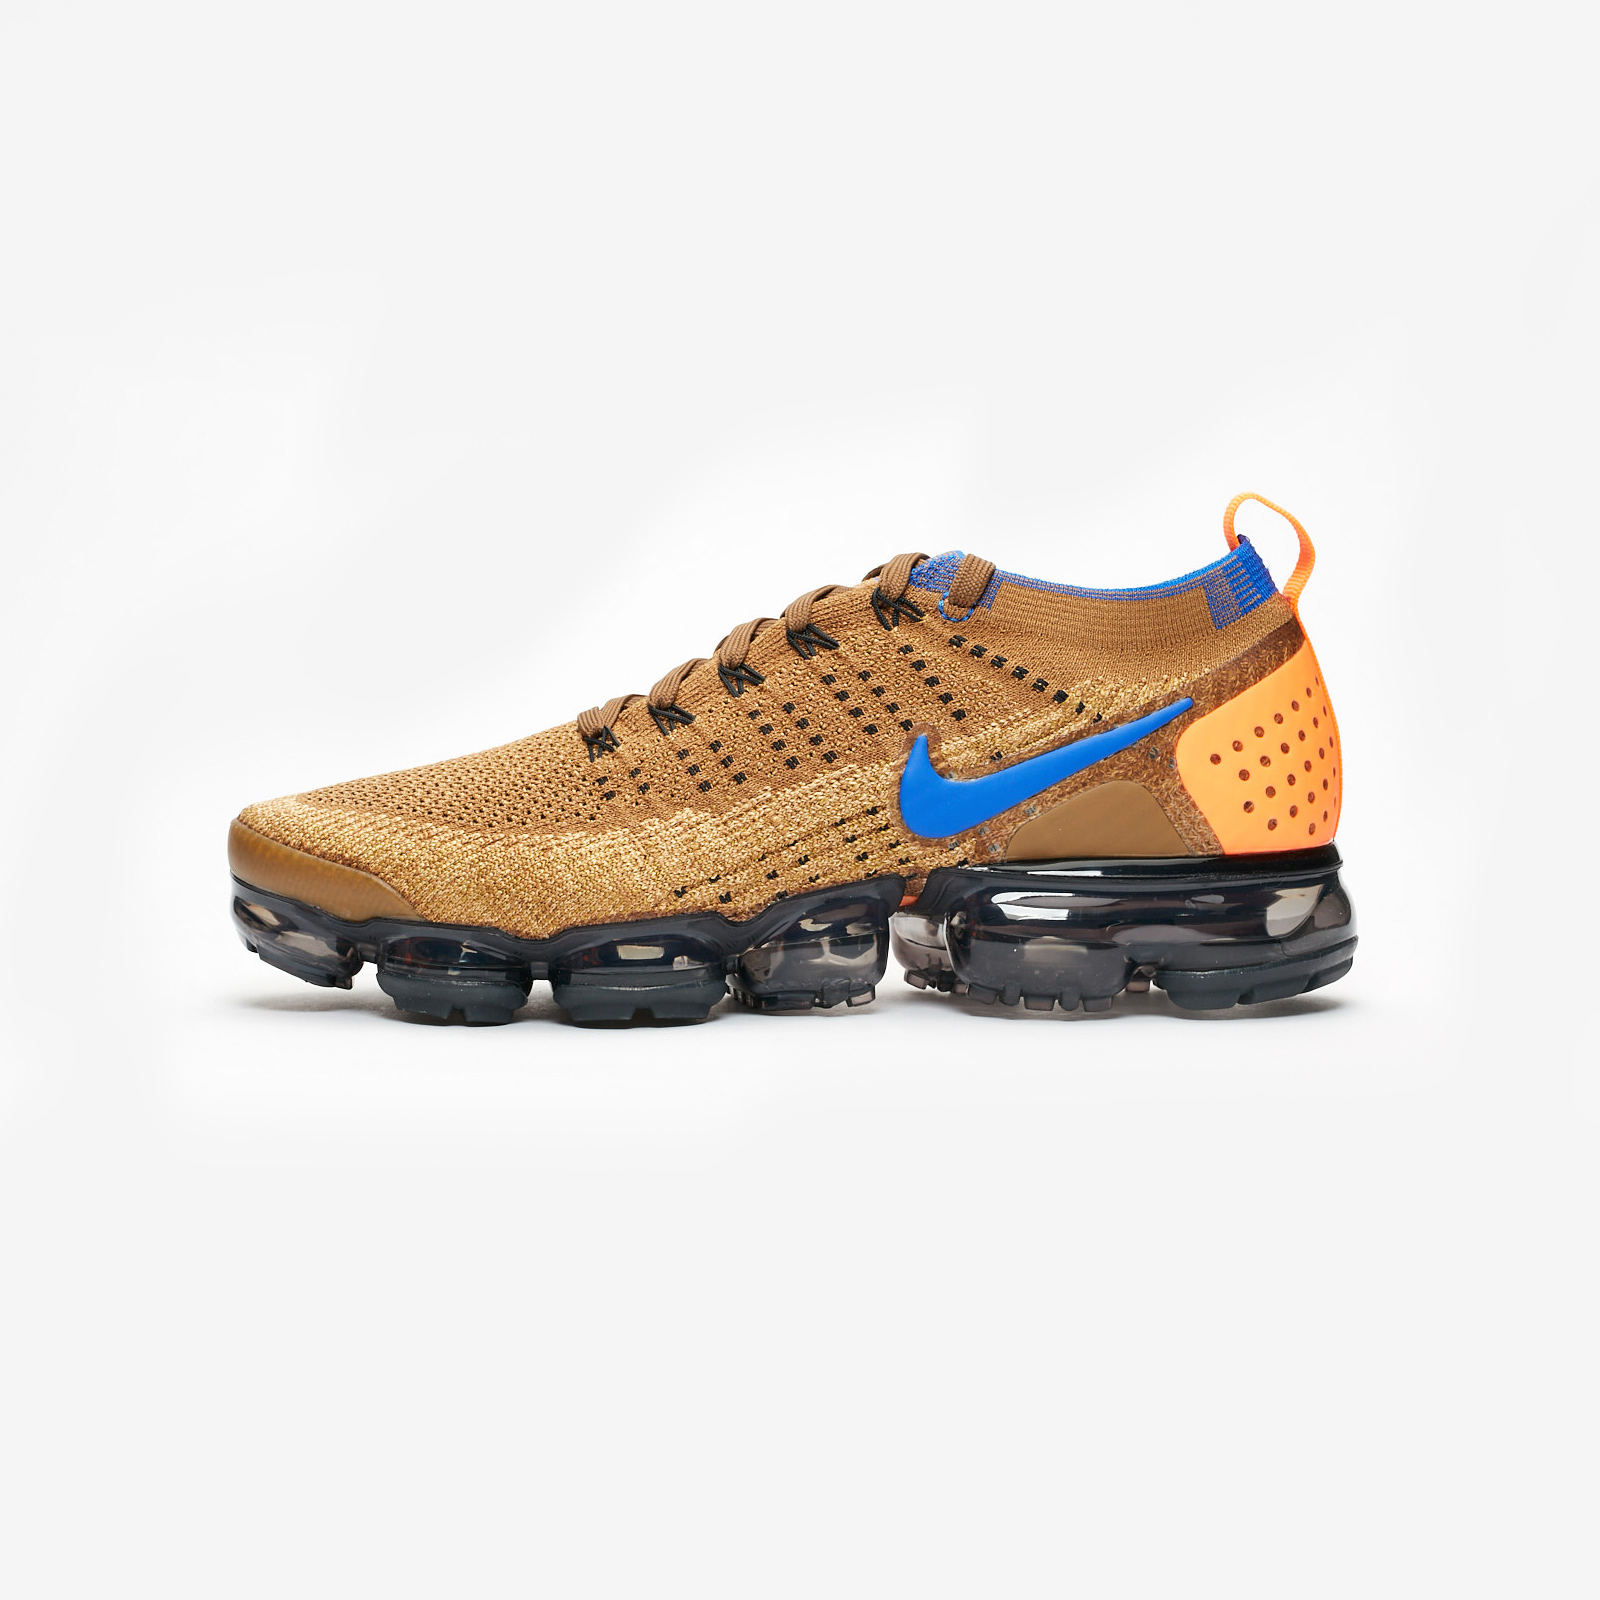 f929c1651fc Nike Air Vapormax Flyknit 2 - 942842-203 - Sneakersnstuff